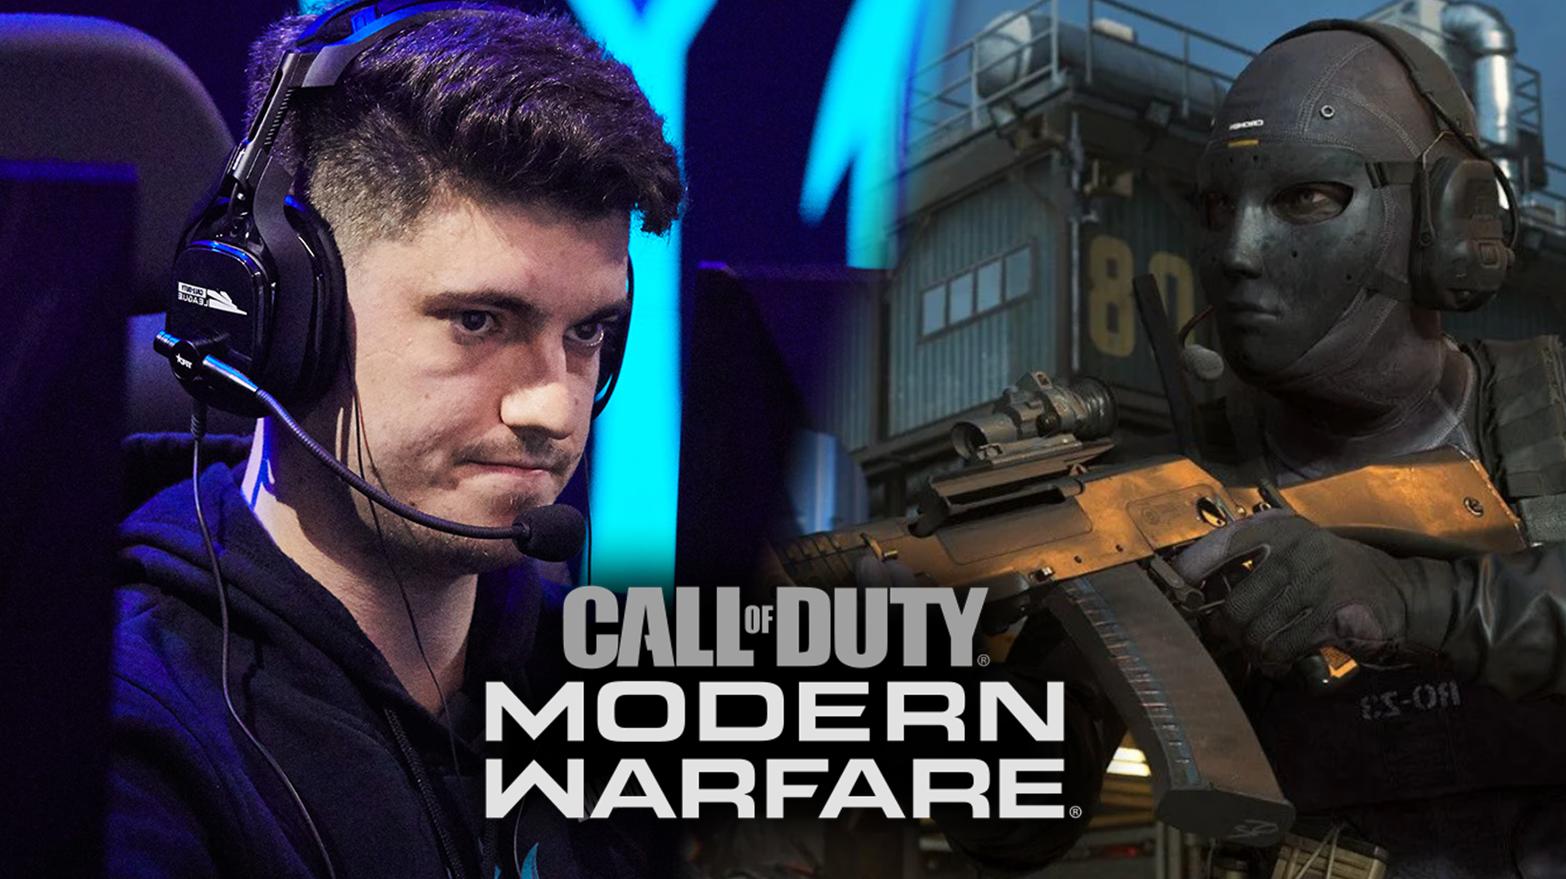 Call of Duty League Octane at LAN / Modern Warfare Season 5 Operator